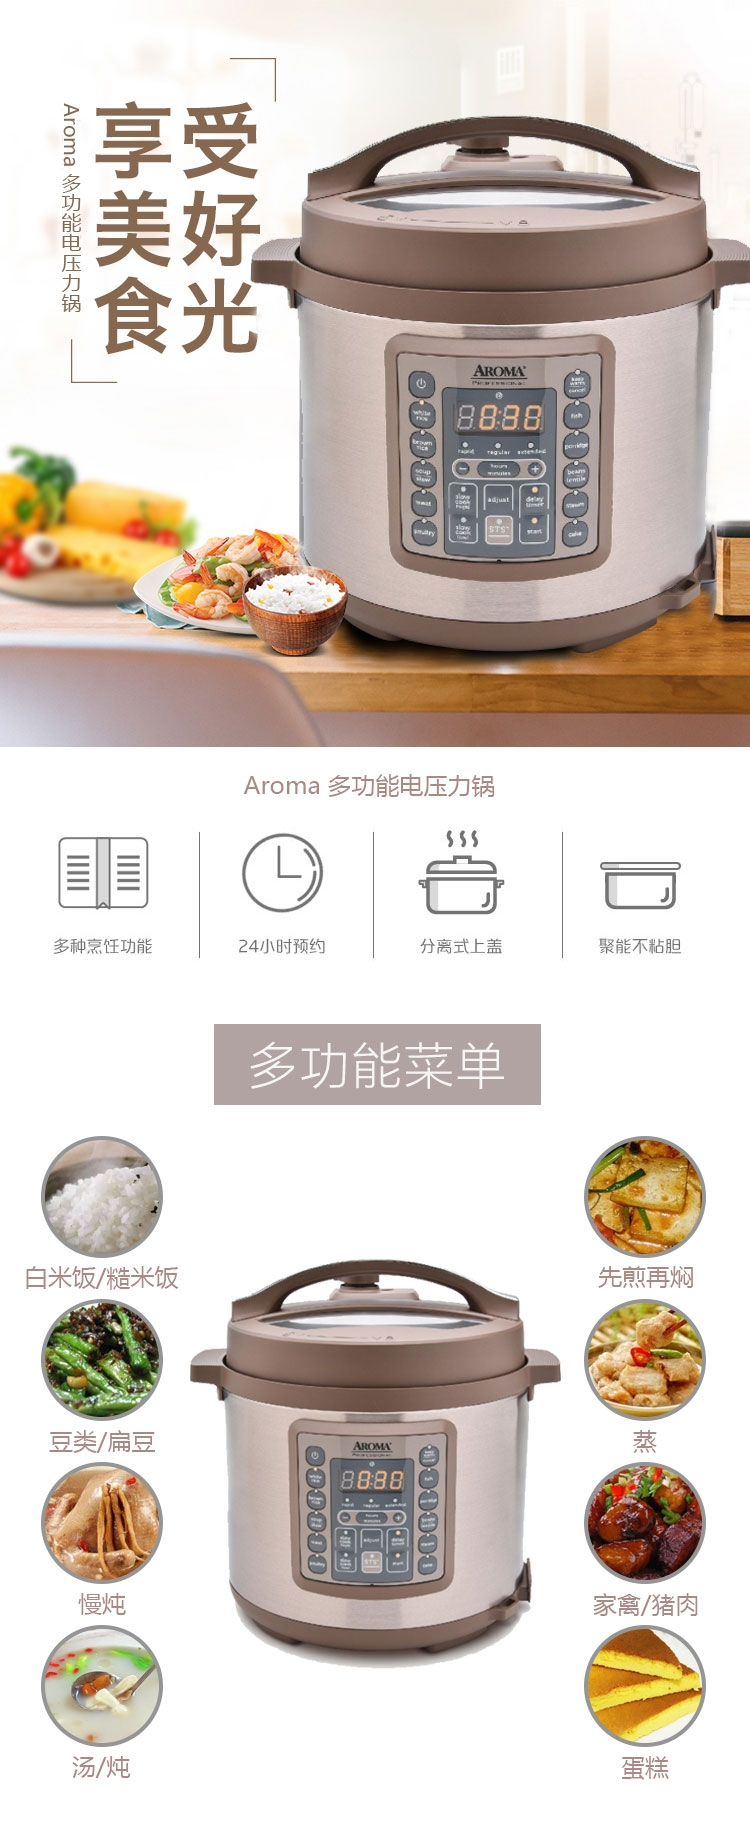 Aroma 多功能电压力锅APC-8016 家用12杯(米饭)6夸脱 锅盖分离 可开盖炒